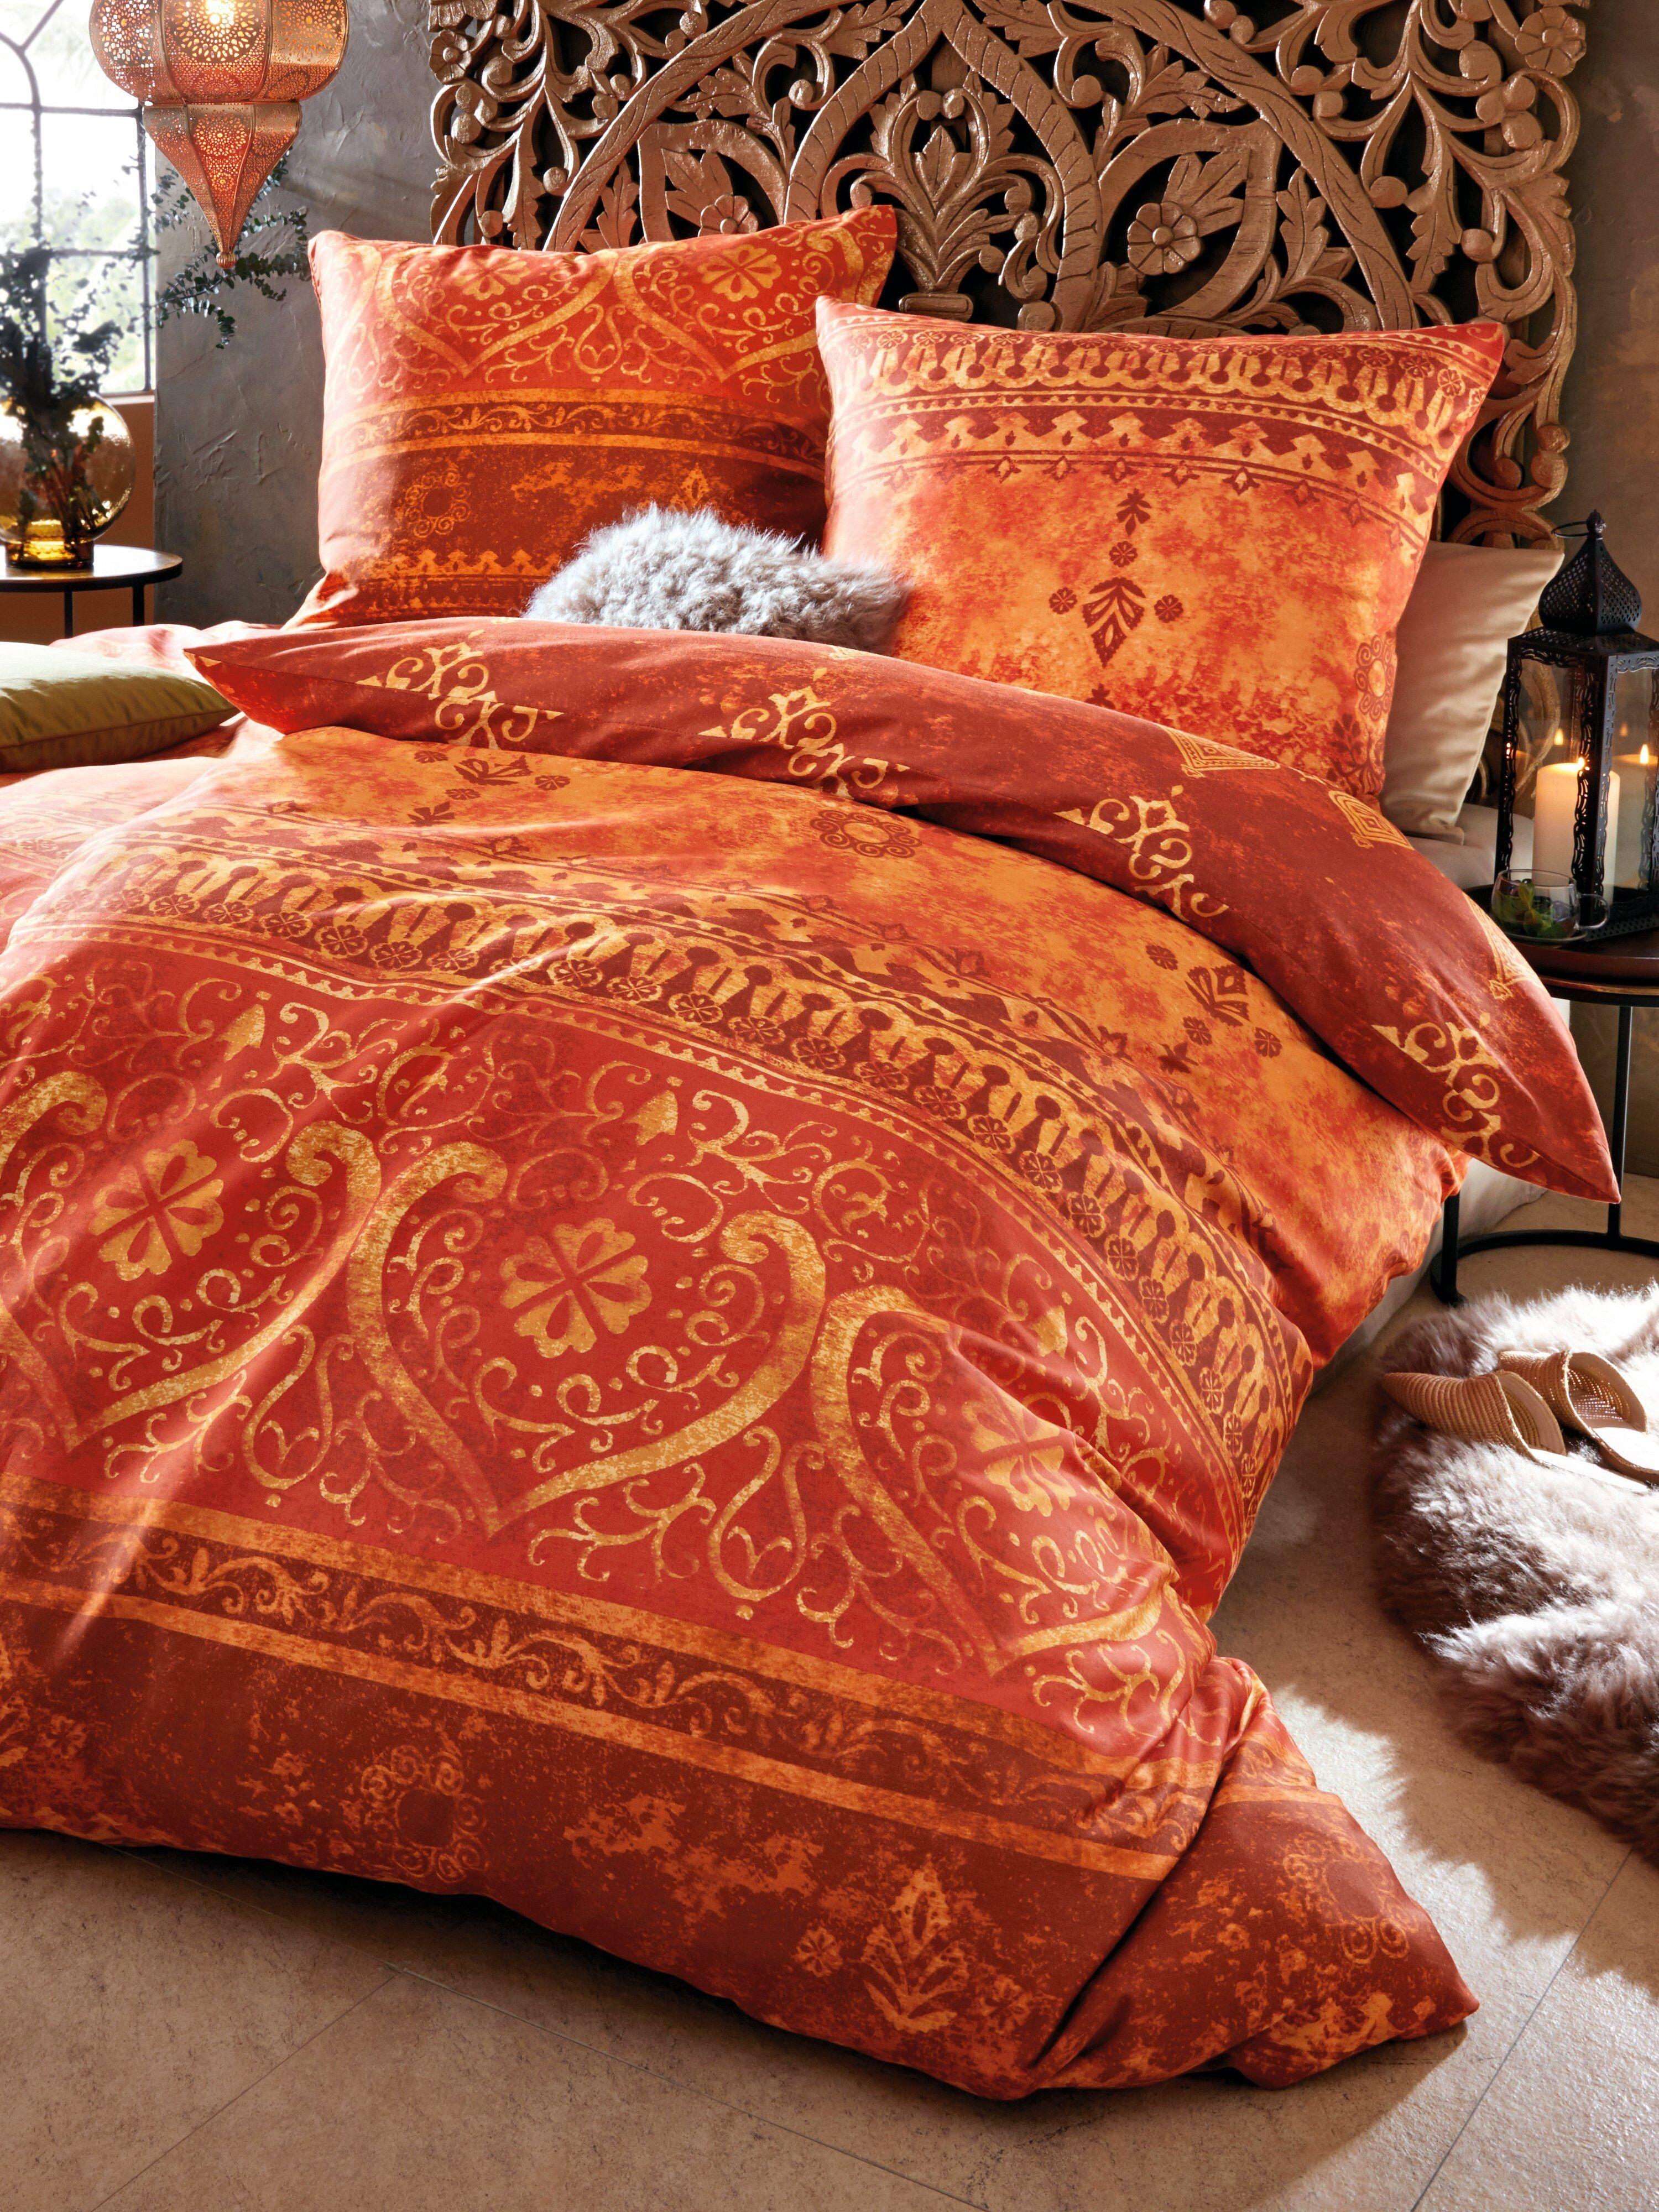 Casatex 2-delt sengesæt Fra Casatex orange